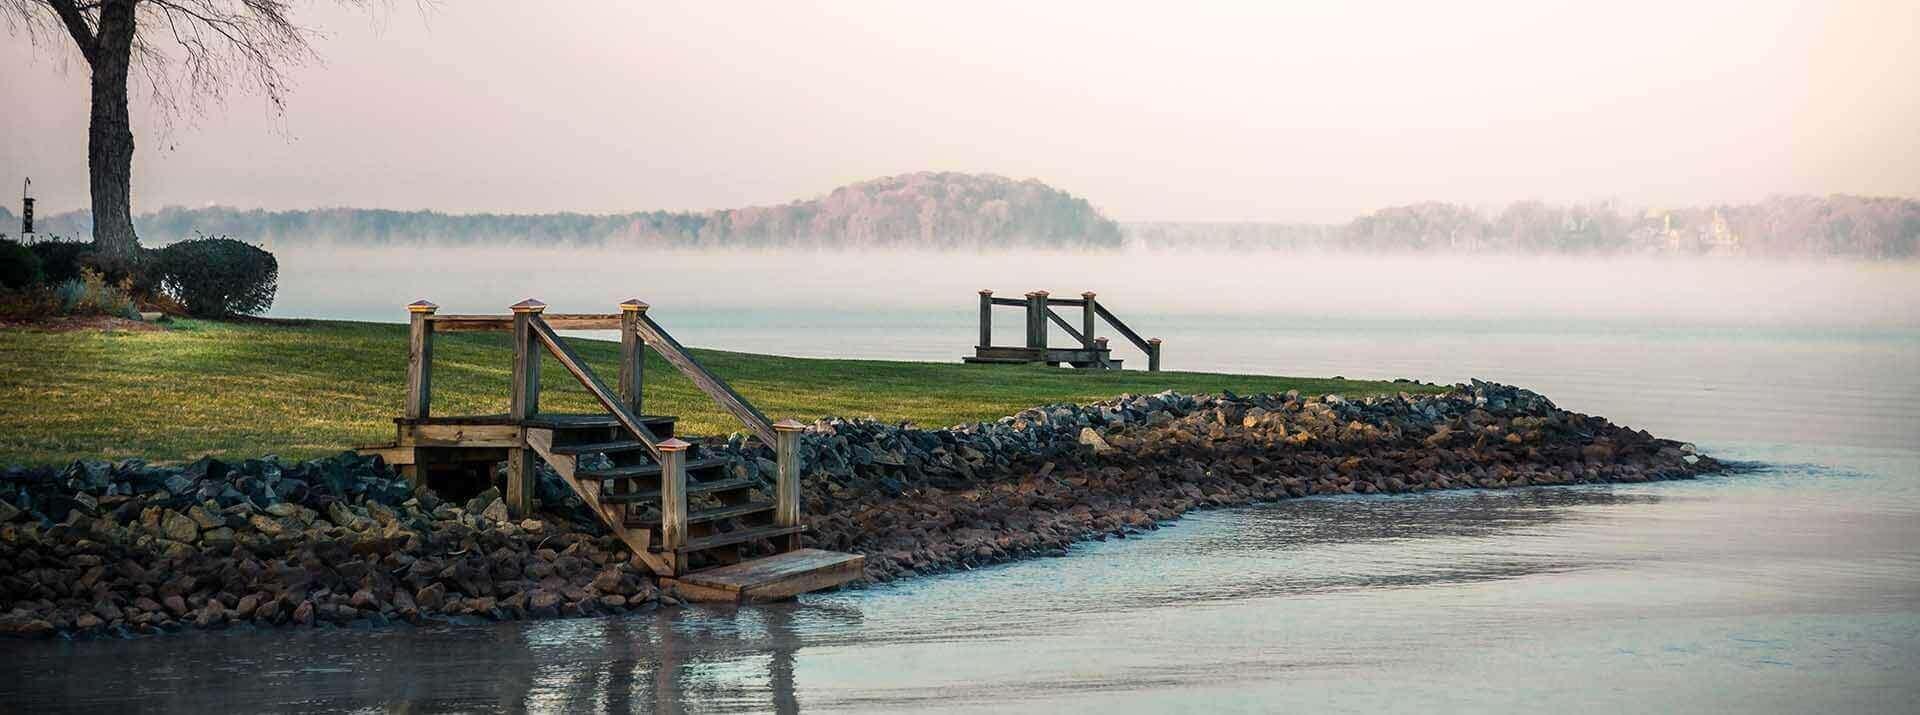 Fog over Lake Norman, North Carolina at sunrise.